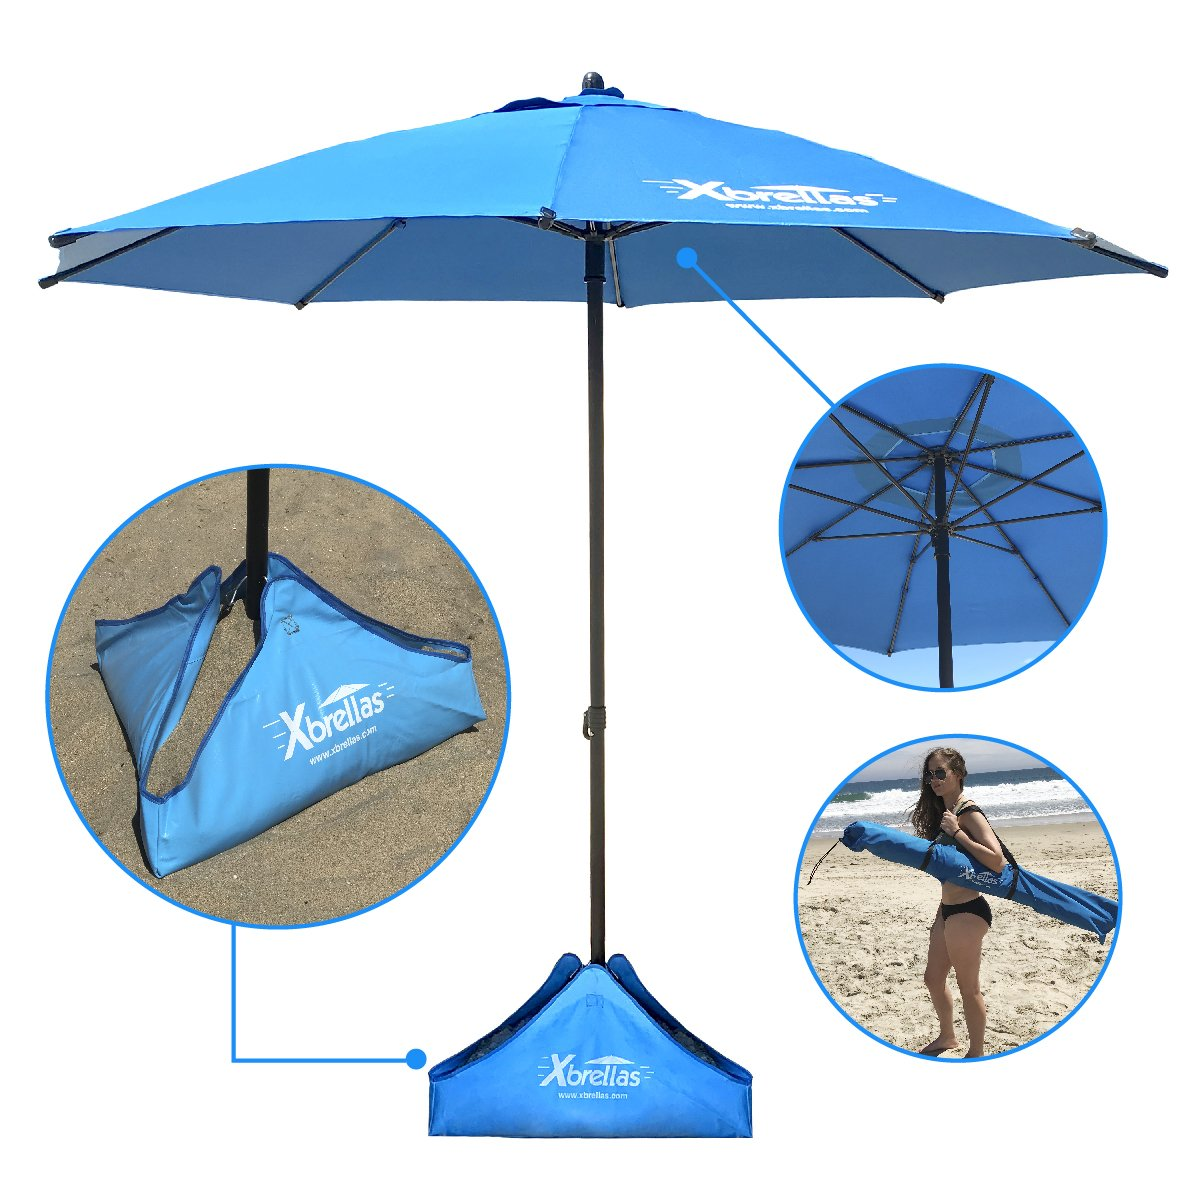 half off 203f9 a88eb Xbrellas -High Wind Resistant Beach Umbrella – Sand Base - 7.5' Round –  Patent Pending